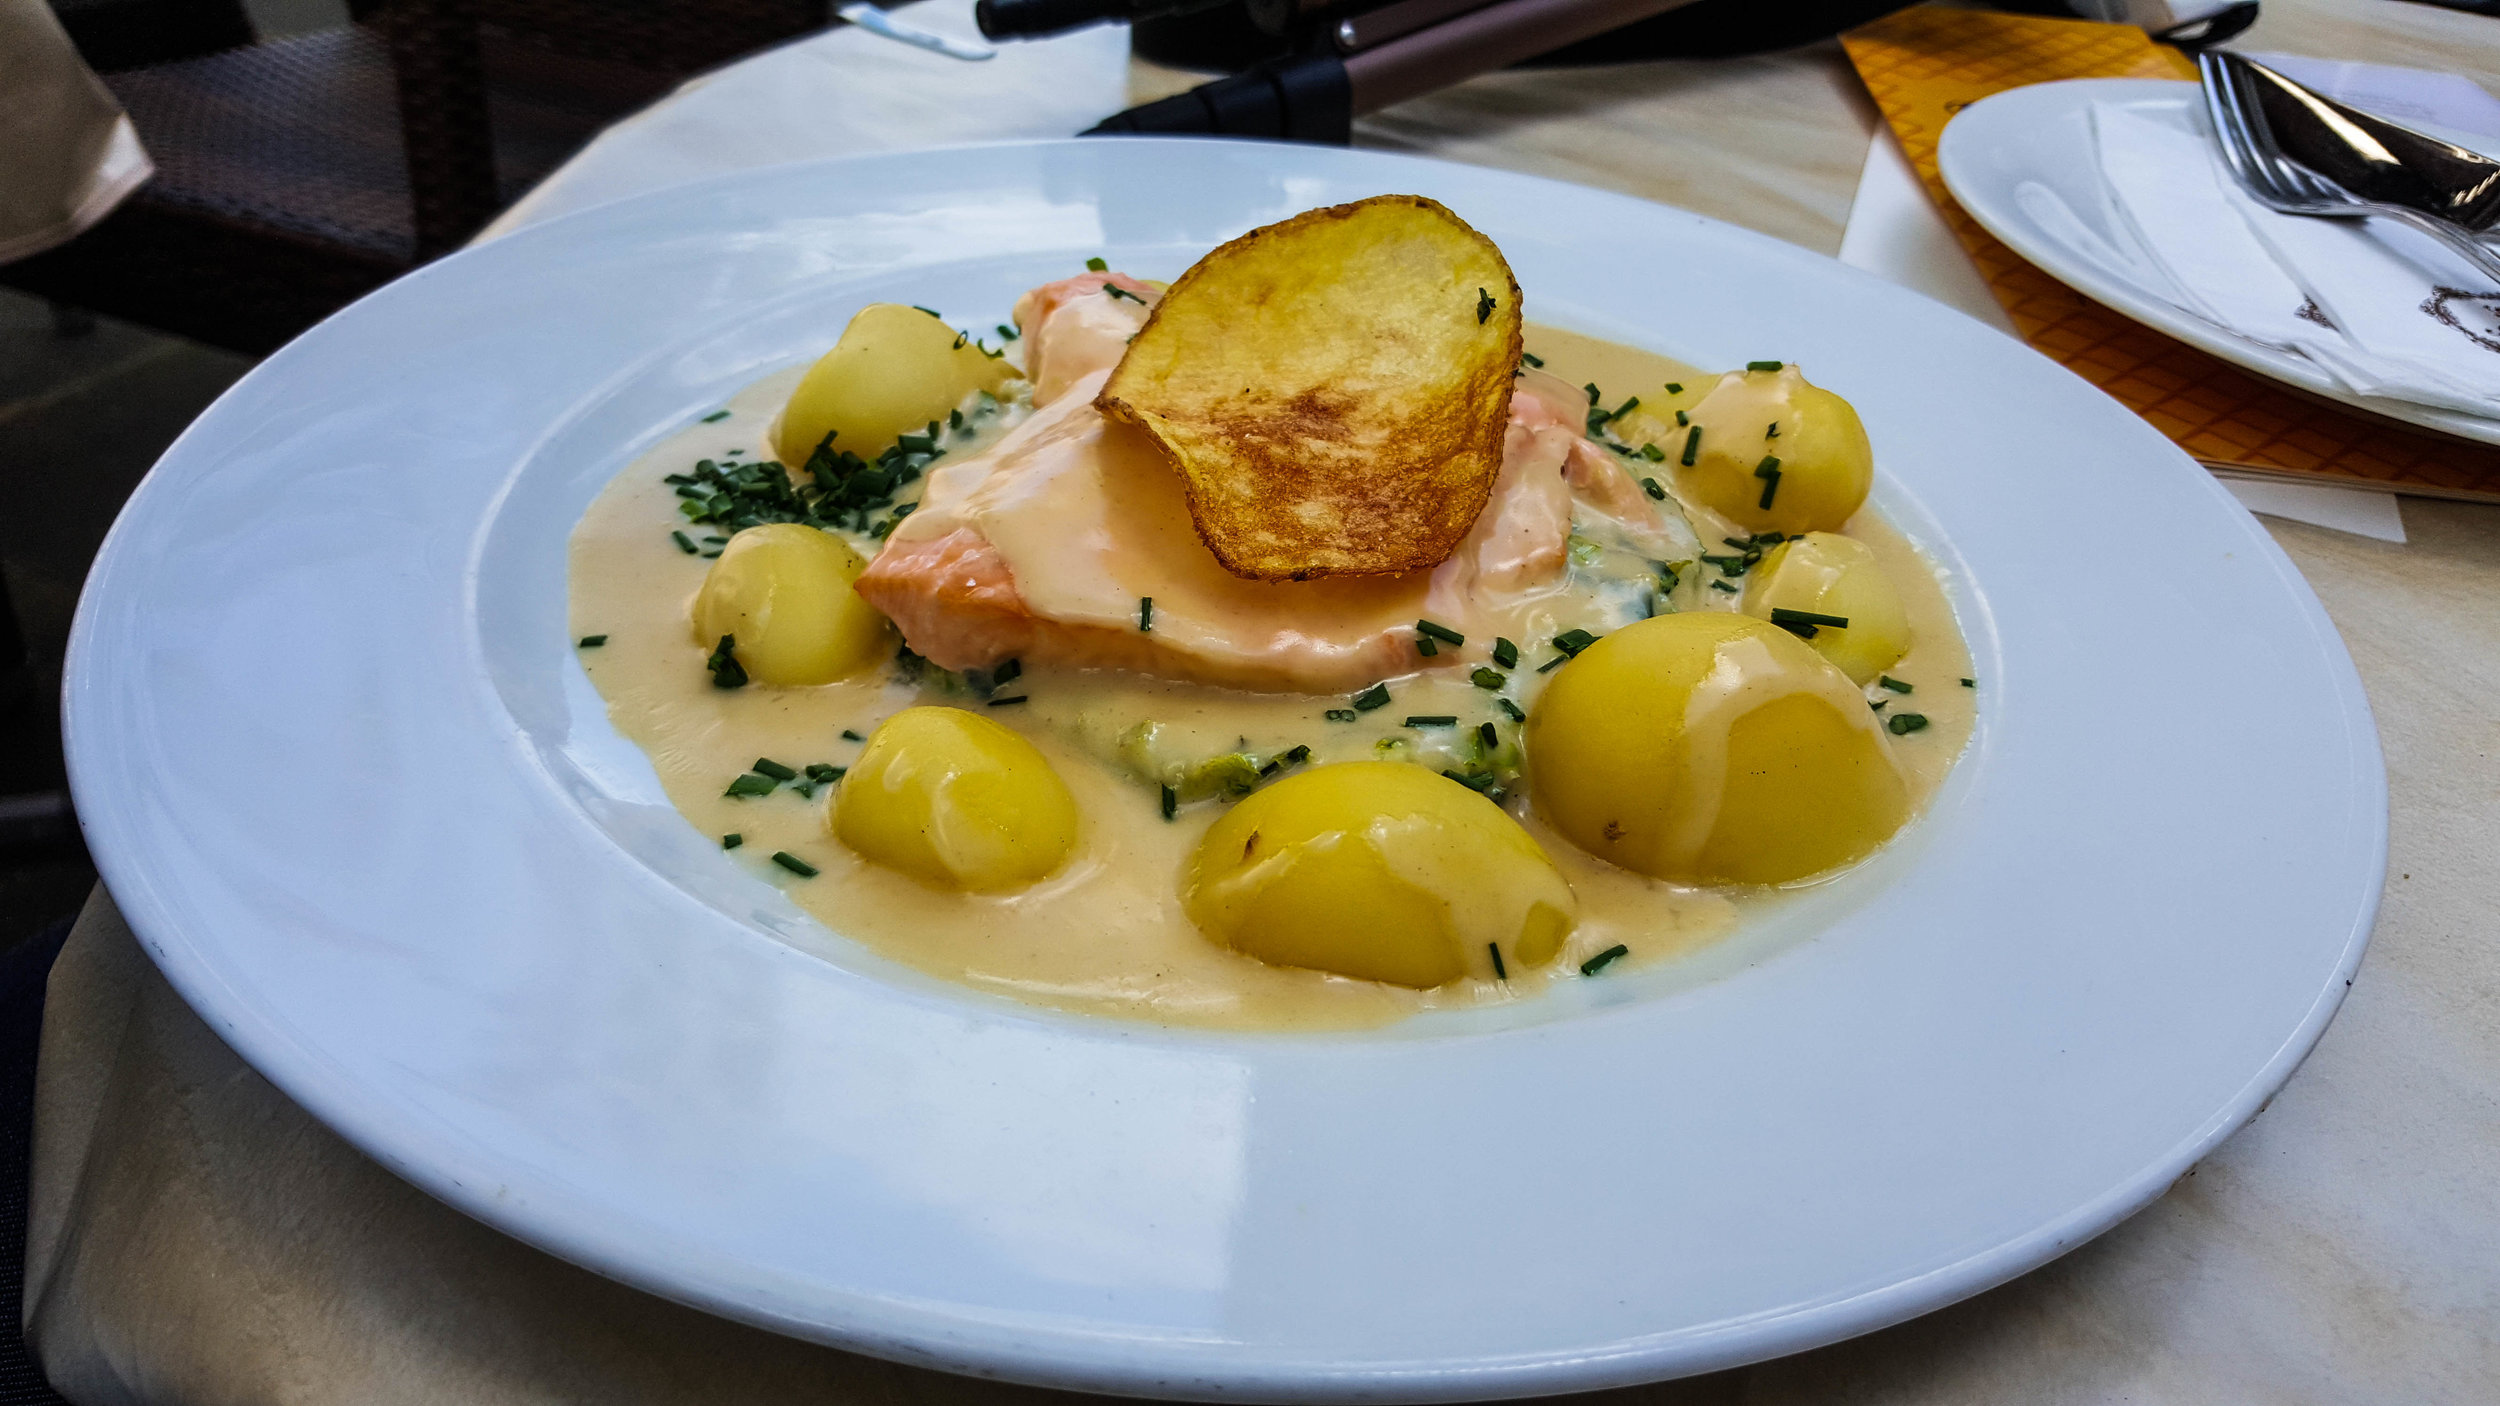 Salmon and (again) potatoes